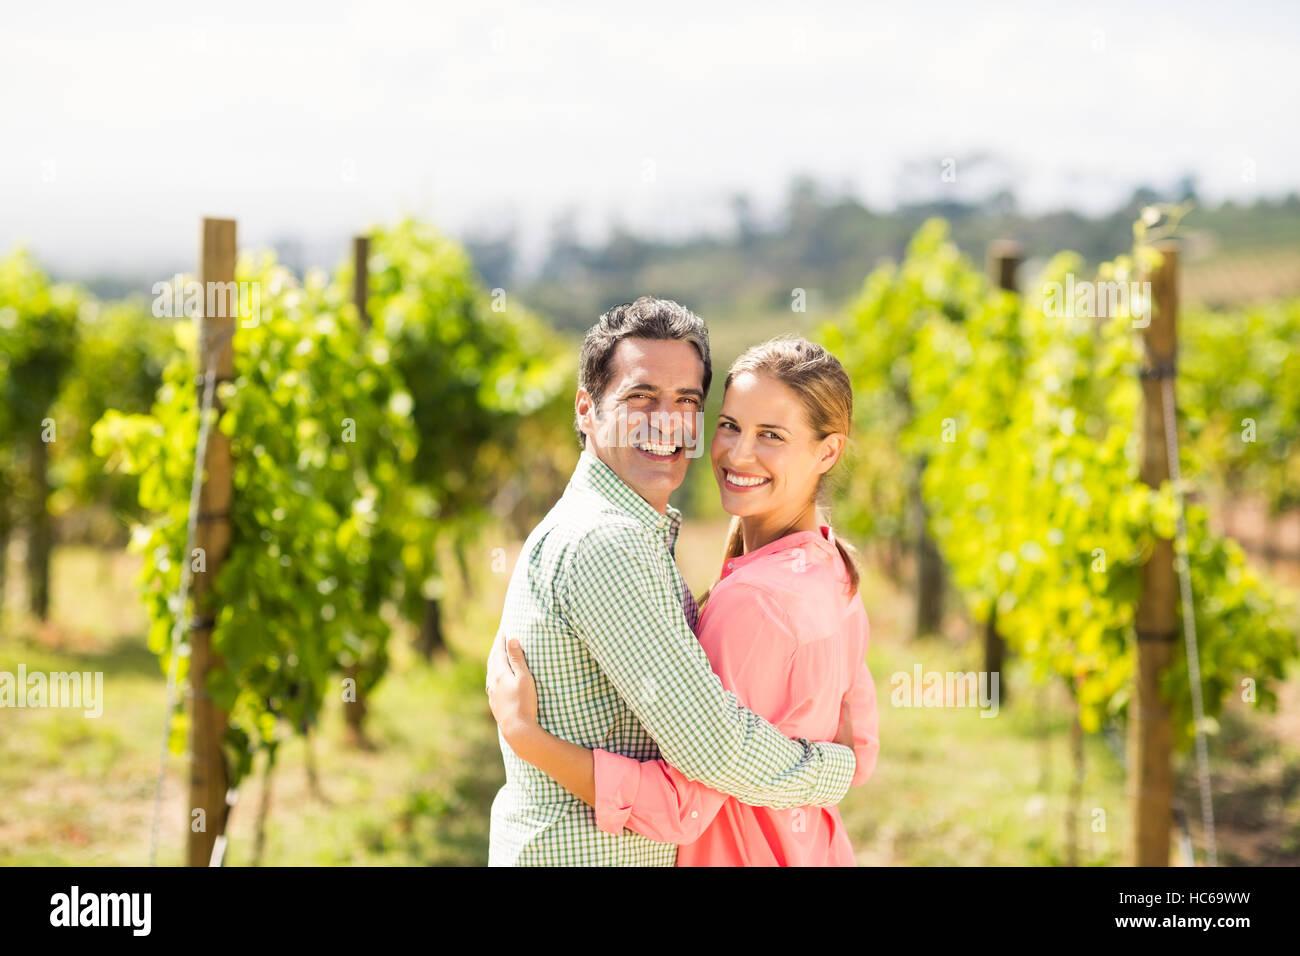 Portrait of happy couple standing with arm around - Stock Image